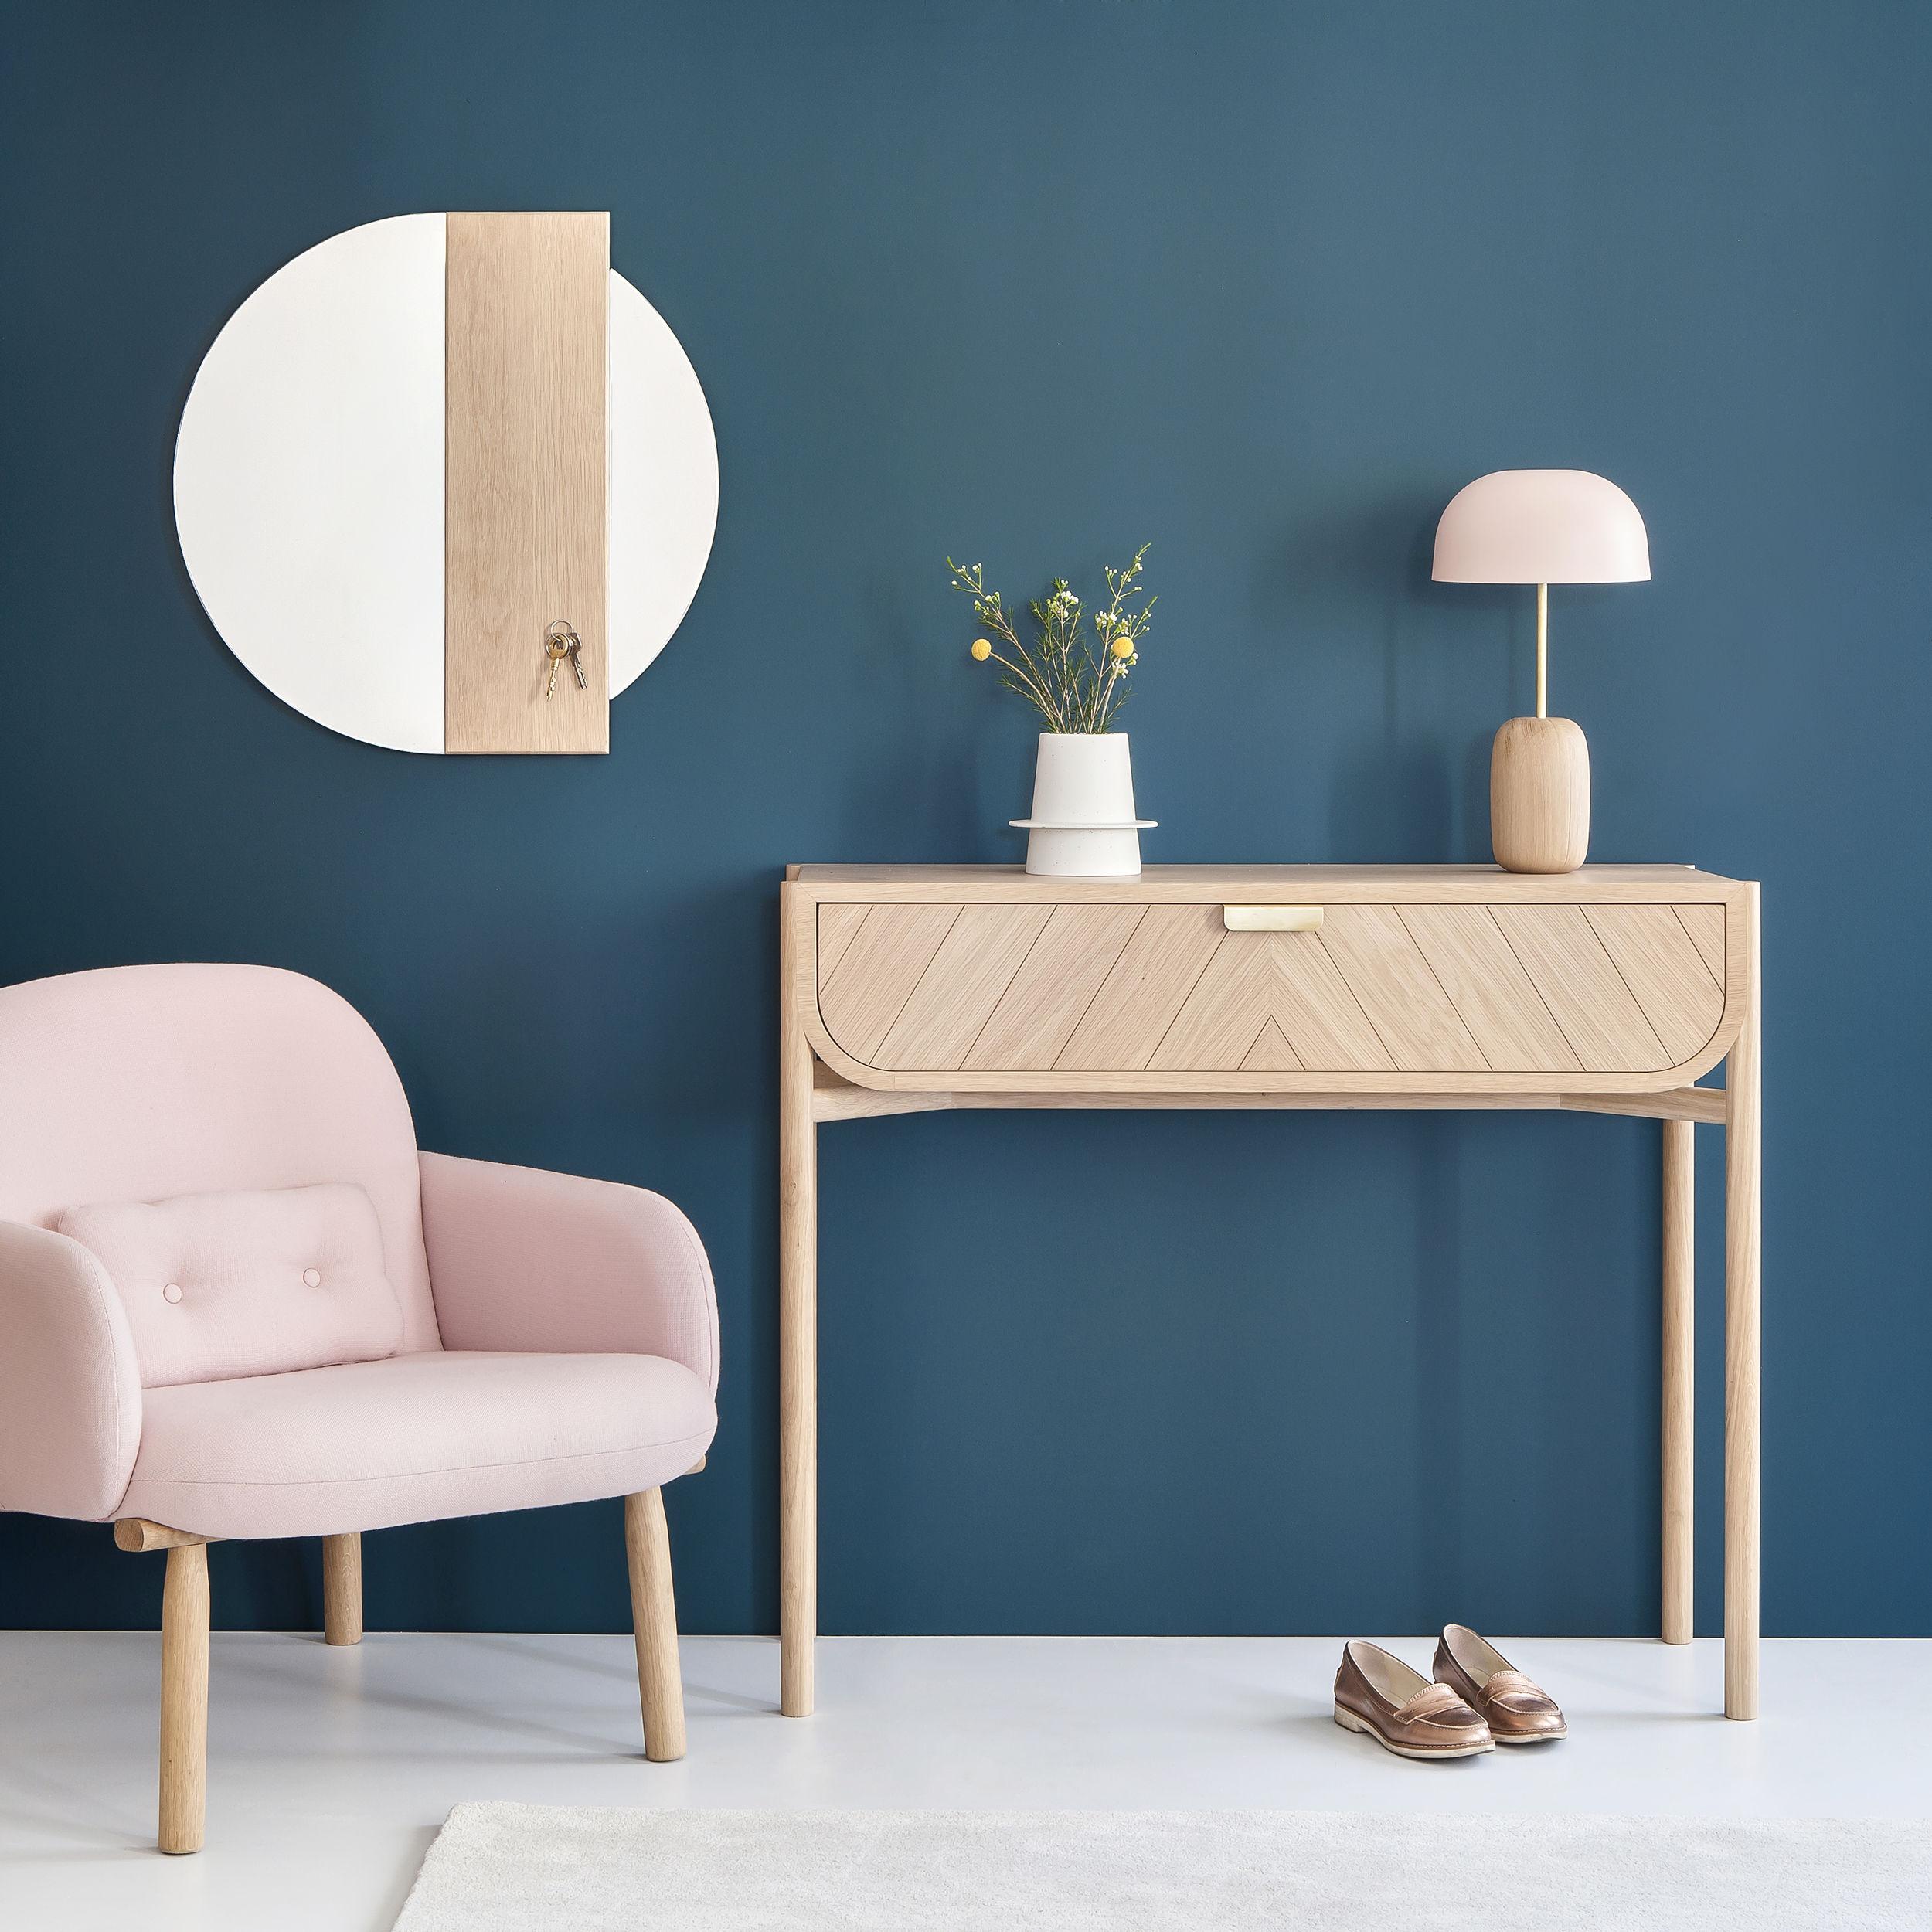 console marius avec tiroir l 100 cm ch ne naturel hart made in design. Black Bedroom Furniture Sets. Home Design Ideas